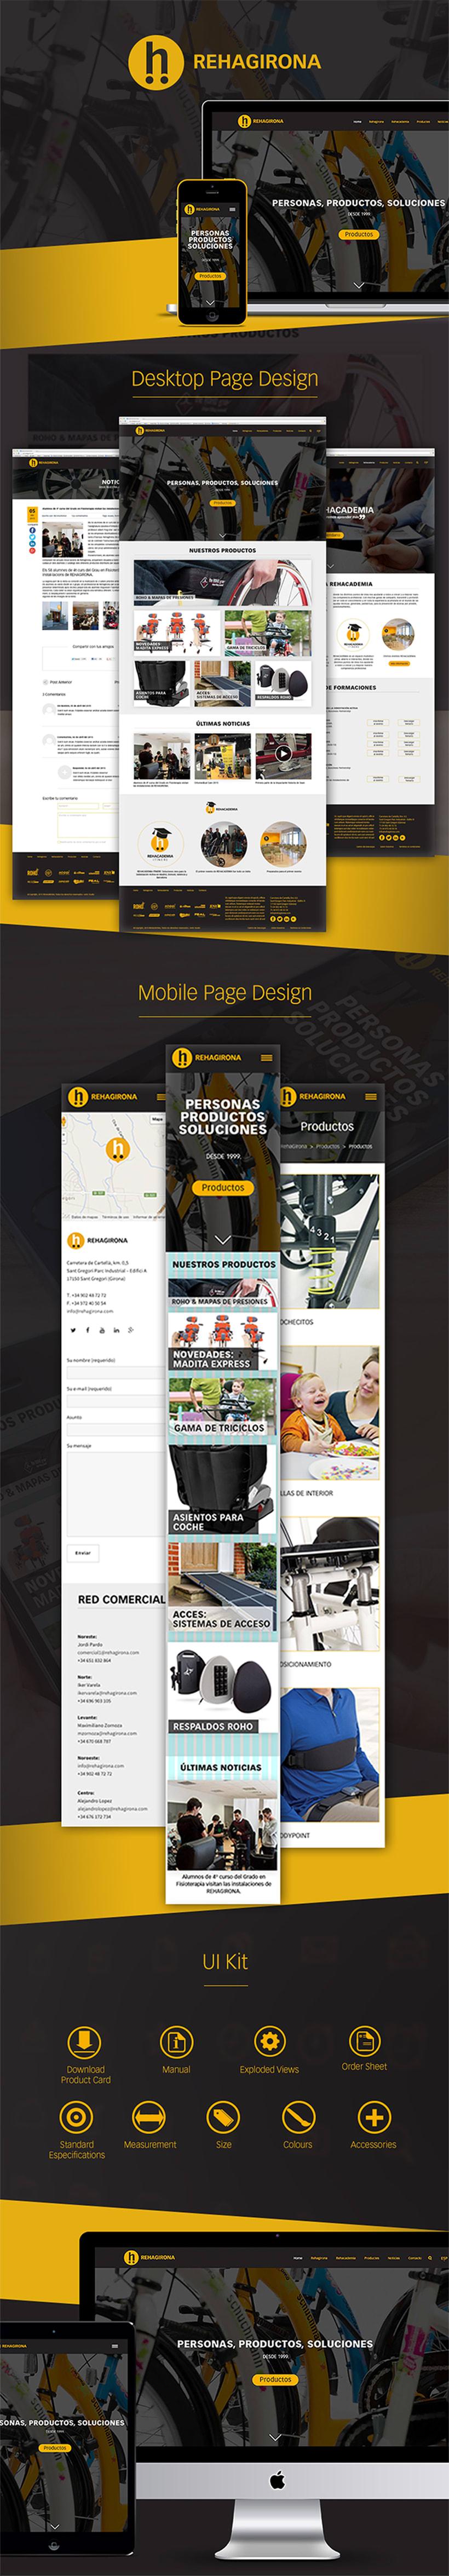 Responsive Web Design RG -1